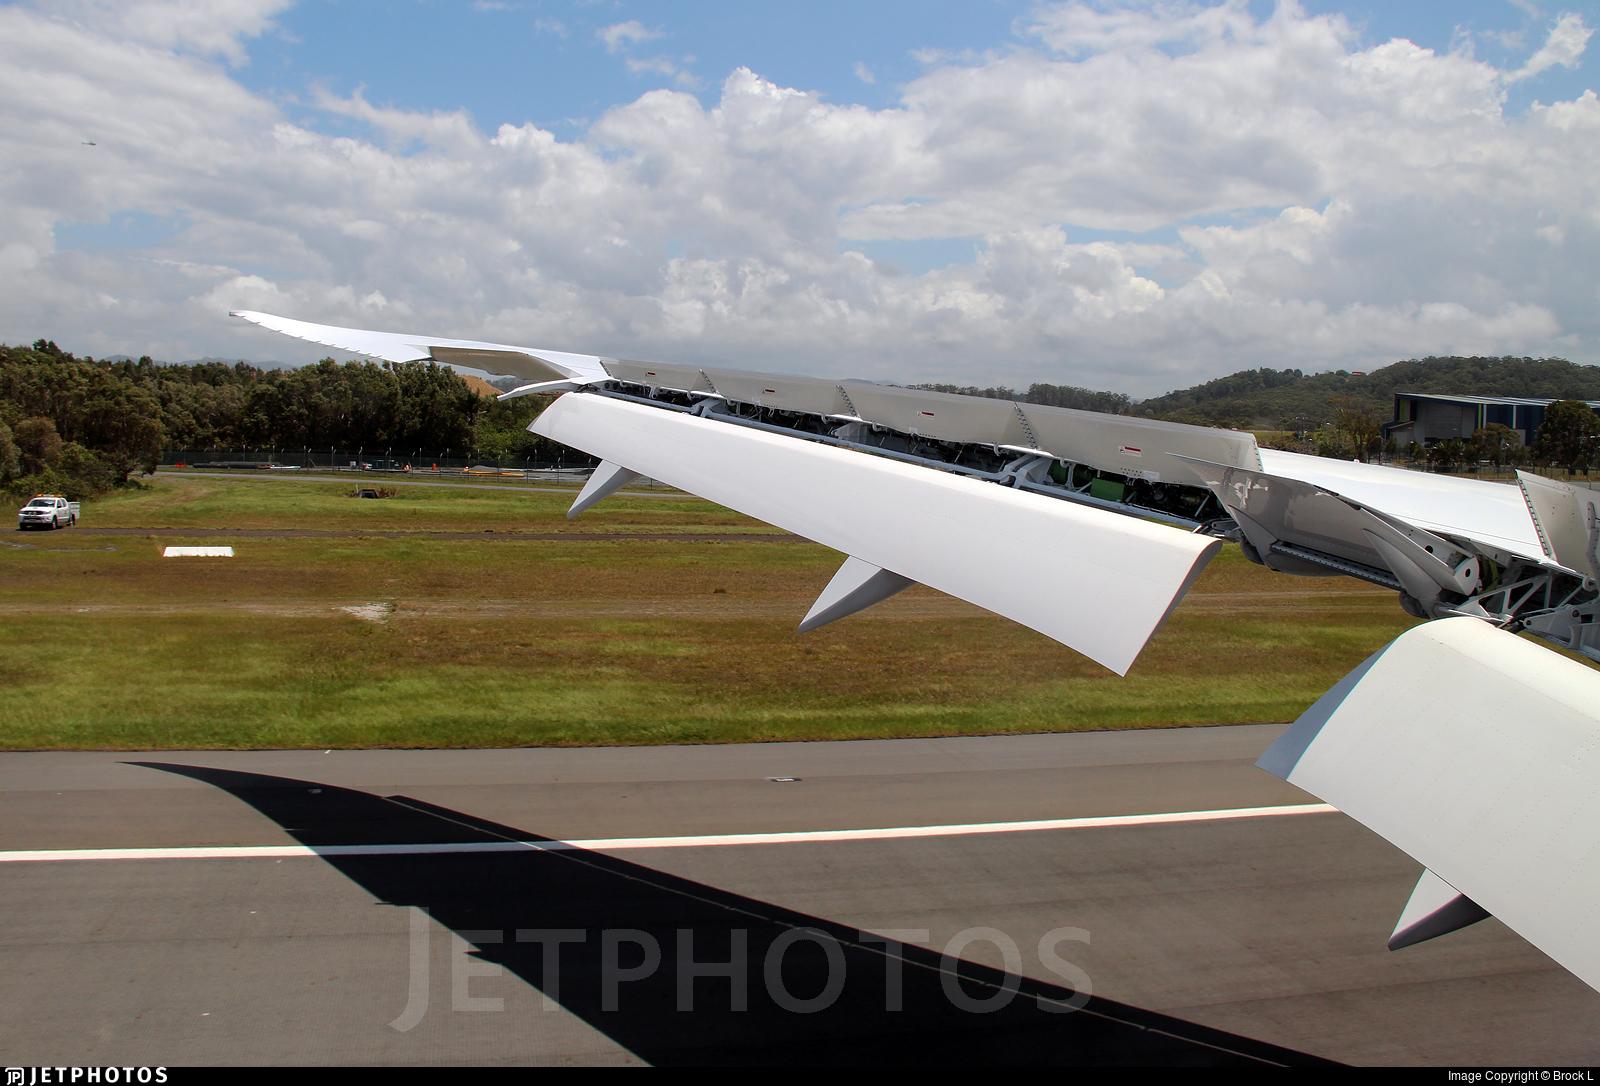 VH-VKA - Boeing 787-8 Dreamliner - Jetstar Airways